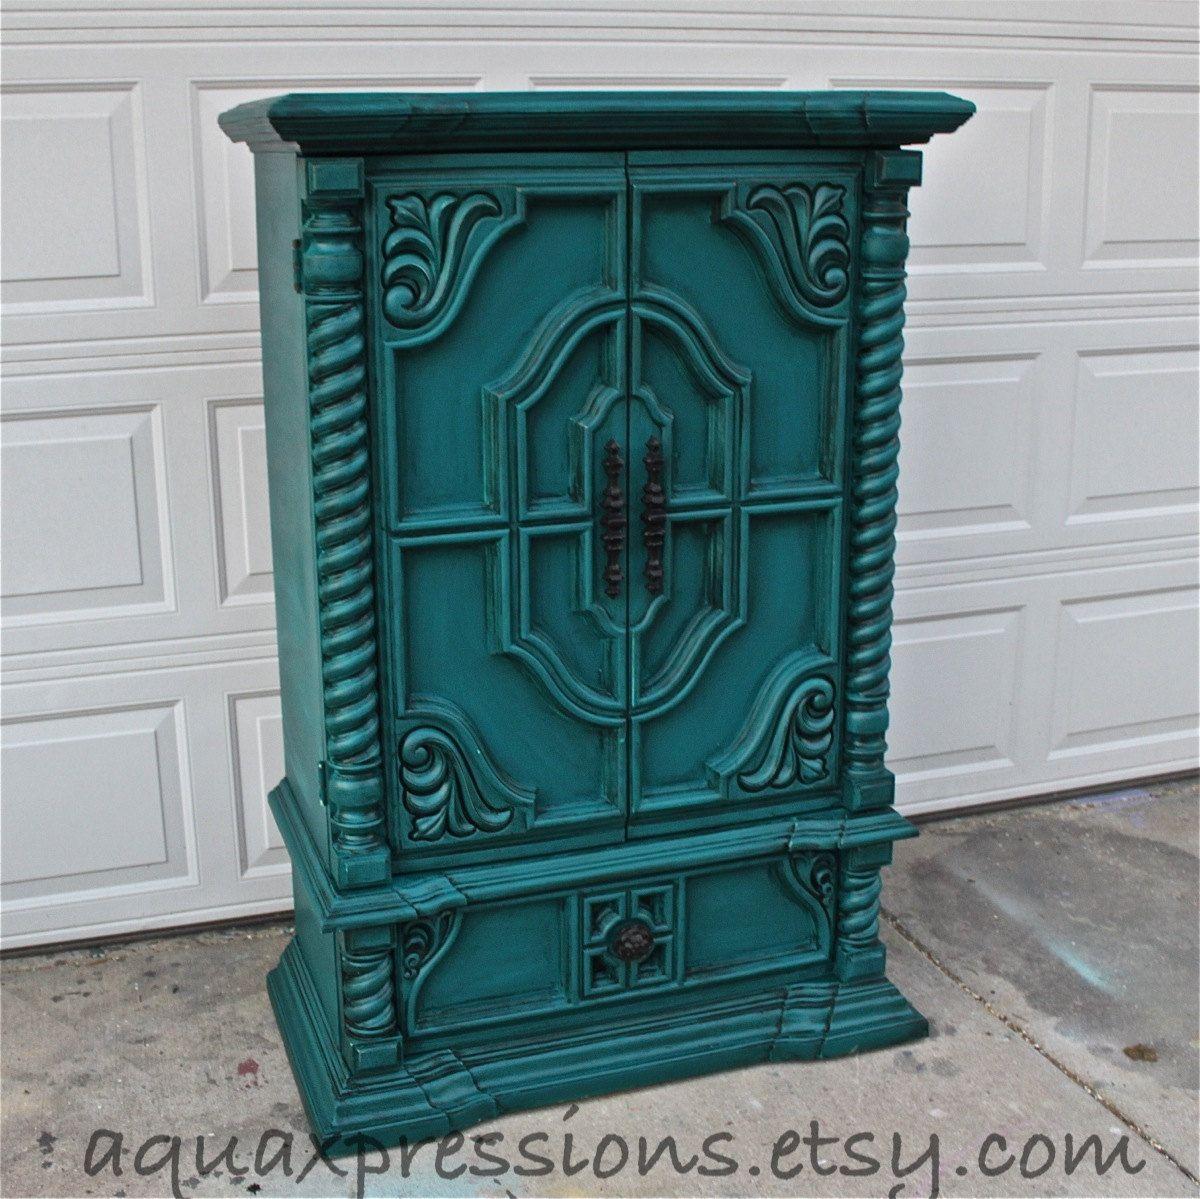 Vintage Armoire /Gypsy Teal / Bedroom Furniture/ Distressed /Black Drawer  Pulls/ TV Stand/ Storage  Custom Paint To Order